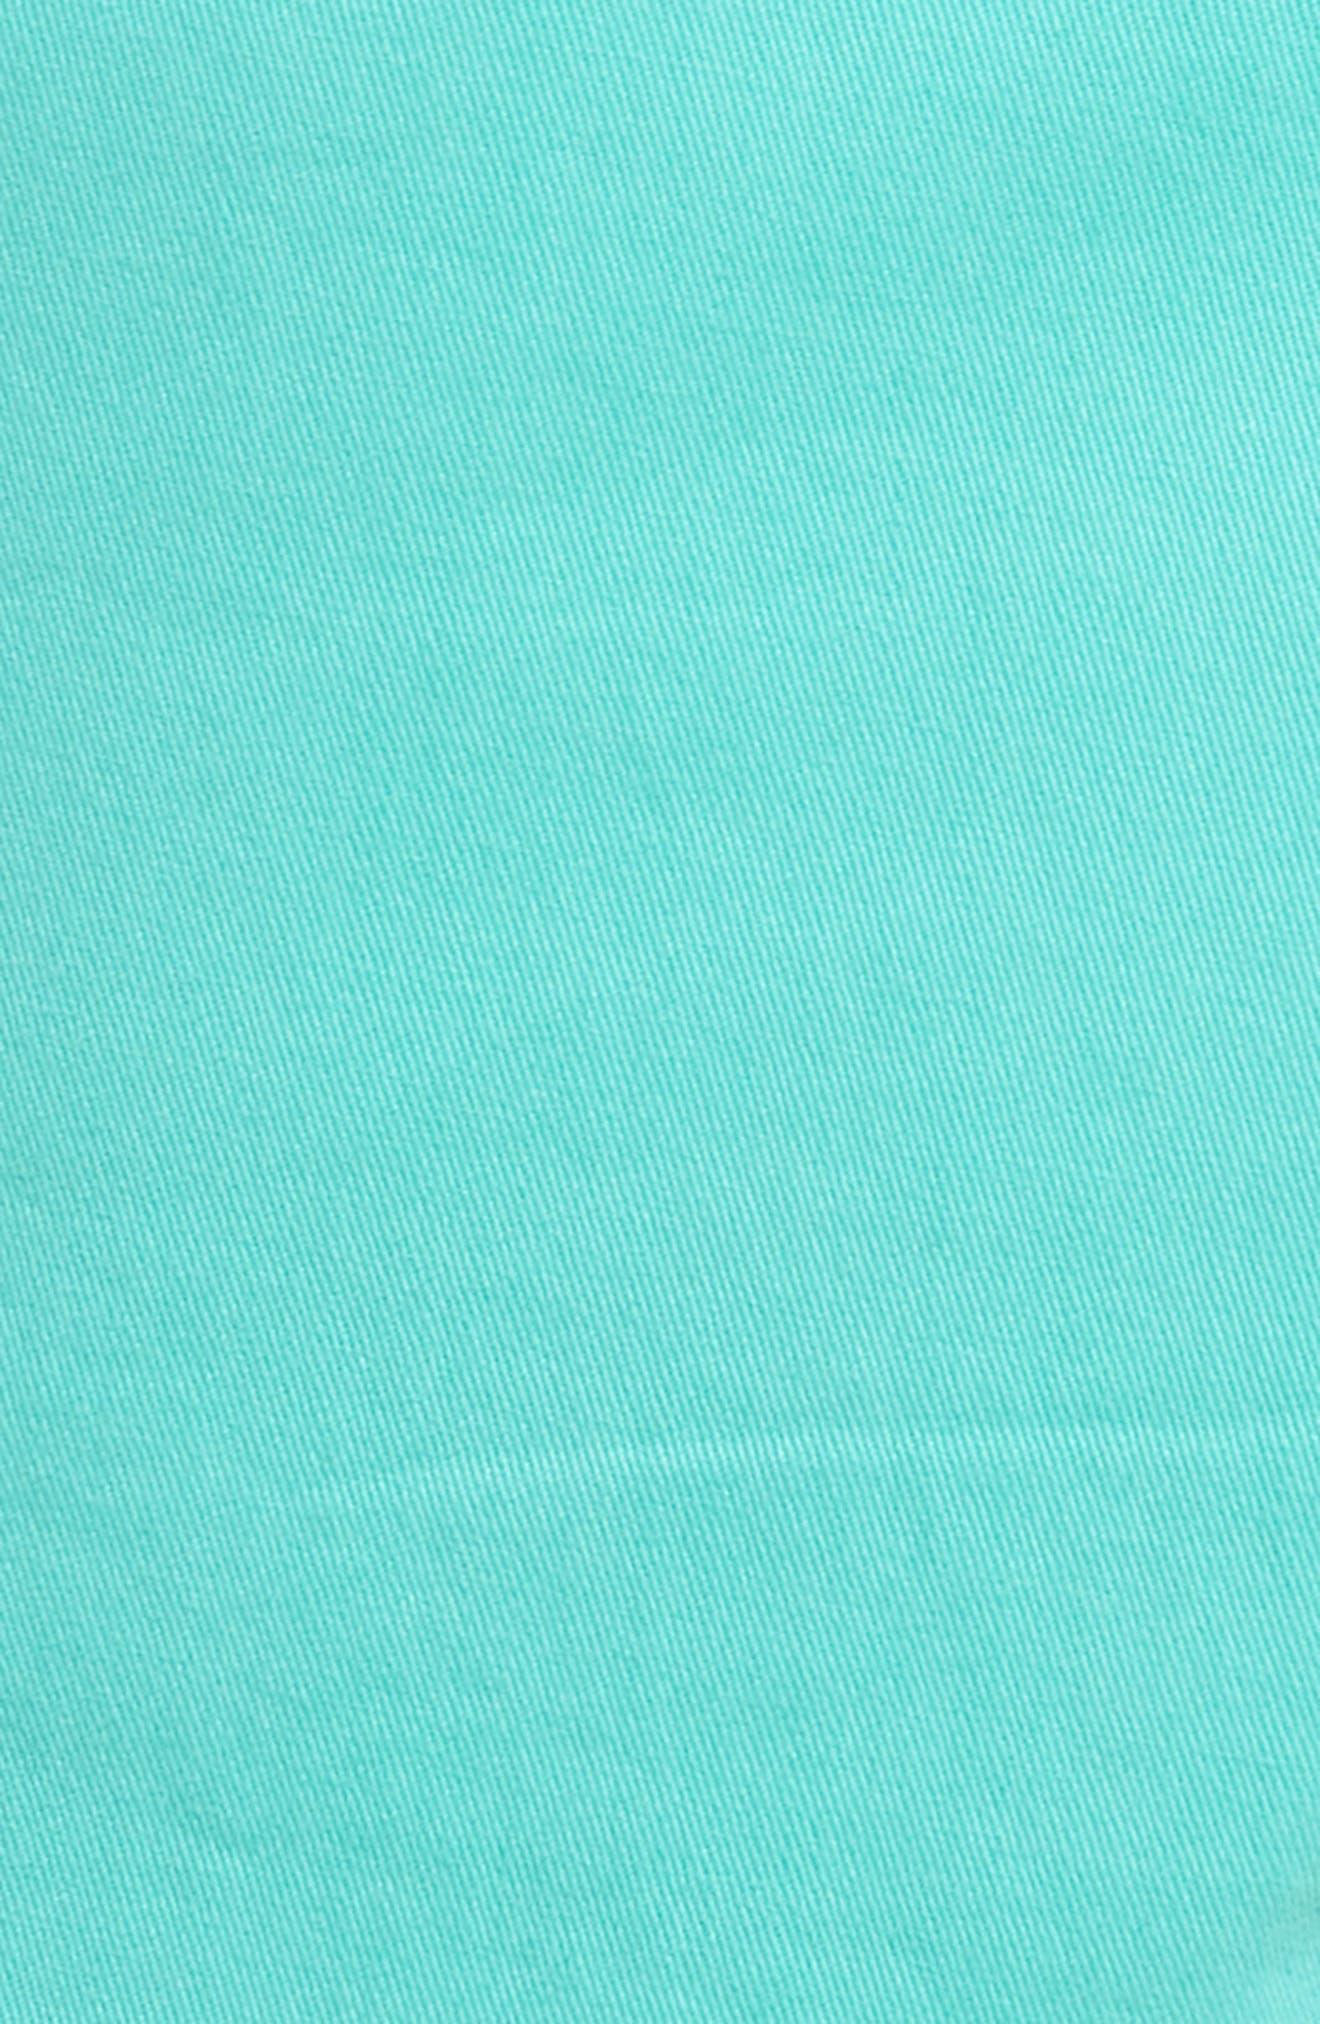 Ballard Slim Fit Stretch Chino 9-Inch Shorts,                             Alternate thumbnail 54, color,